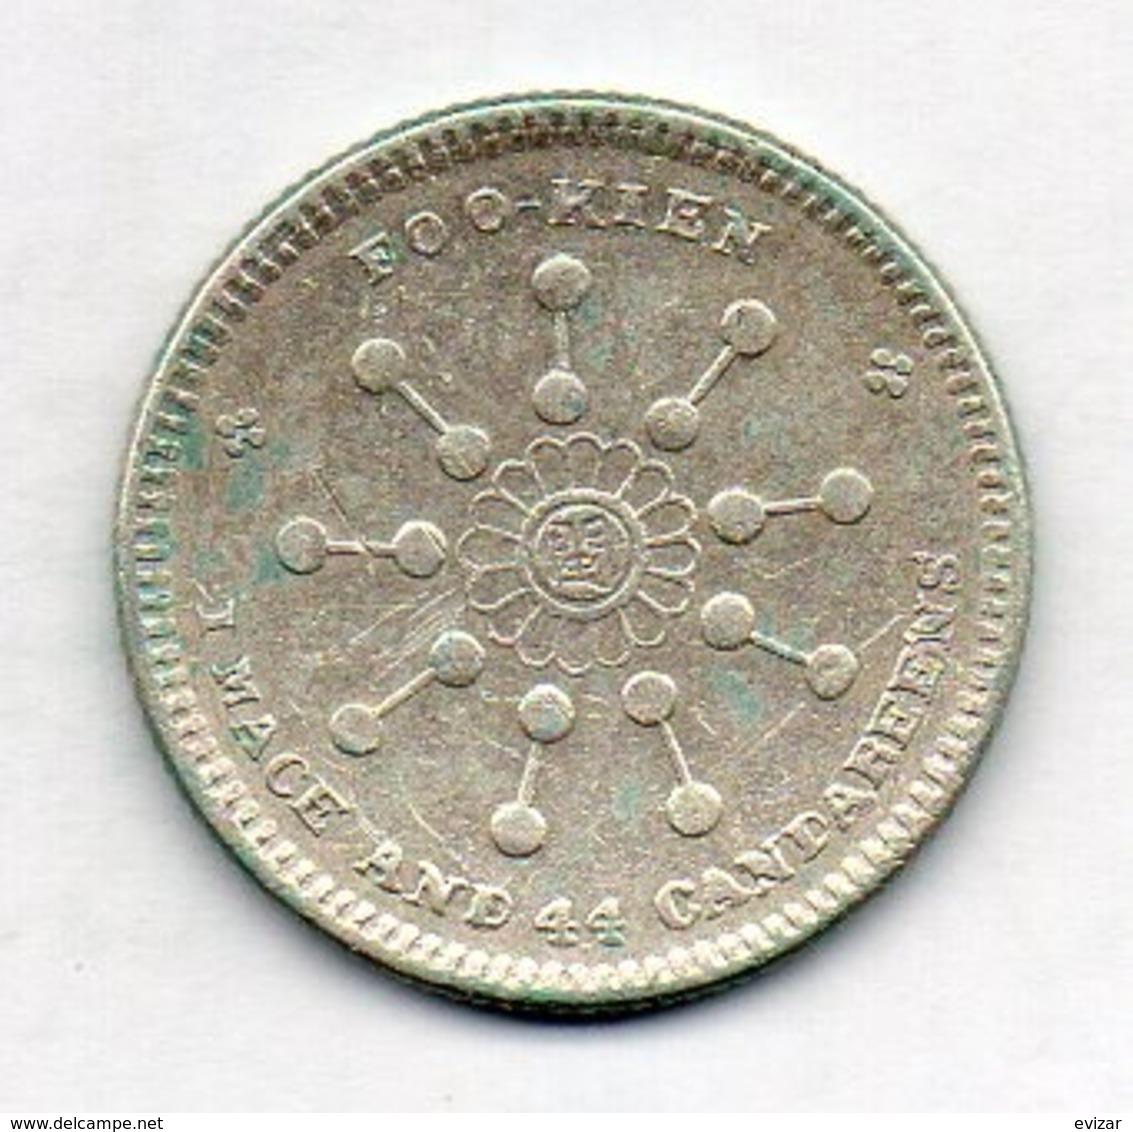 CHINA - FUKIEN PROVINCE, 20 Cents, Silver, Year 1911, KM #377 - Cina